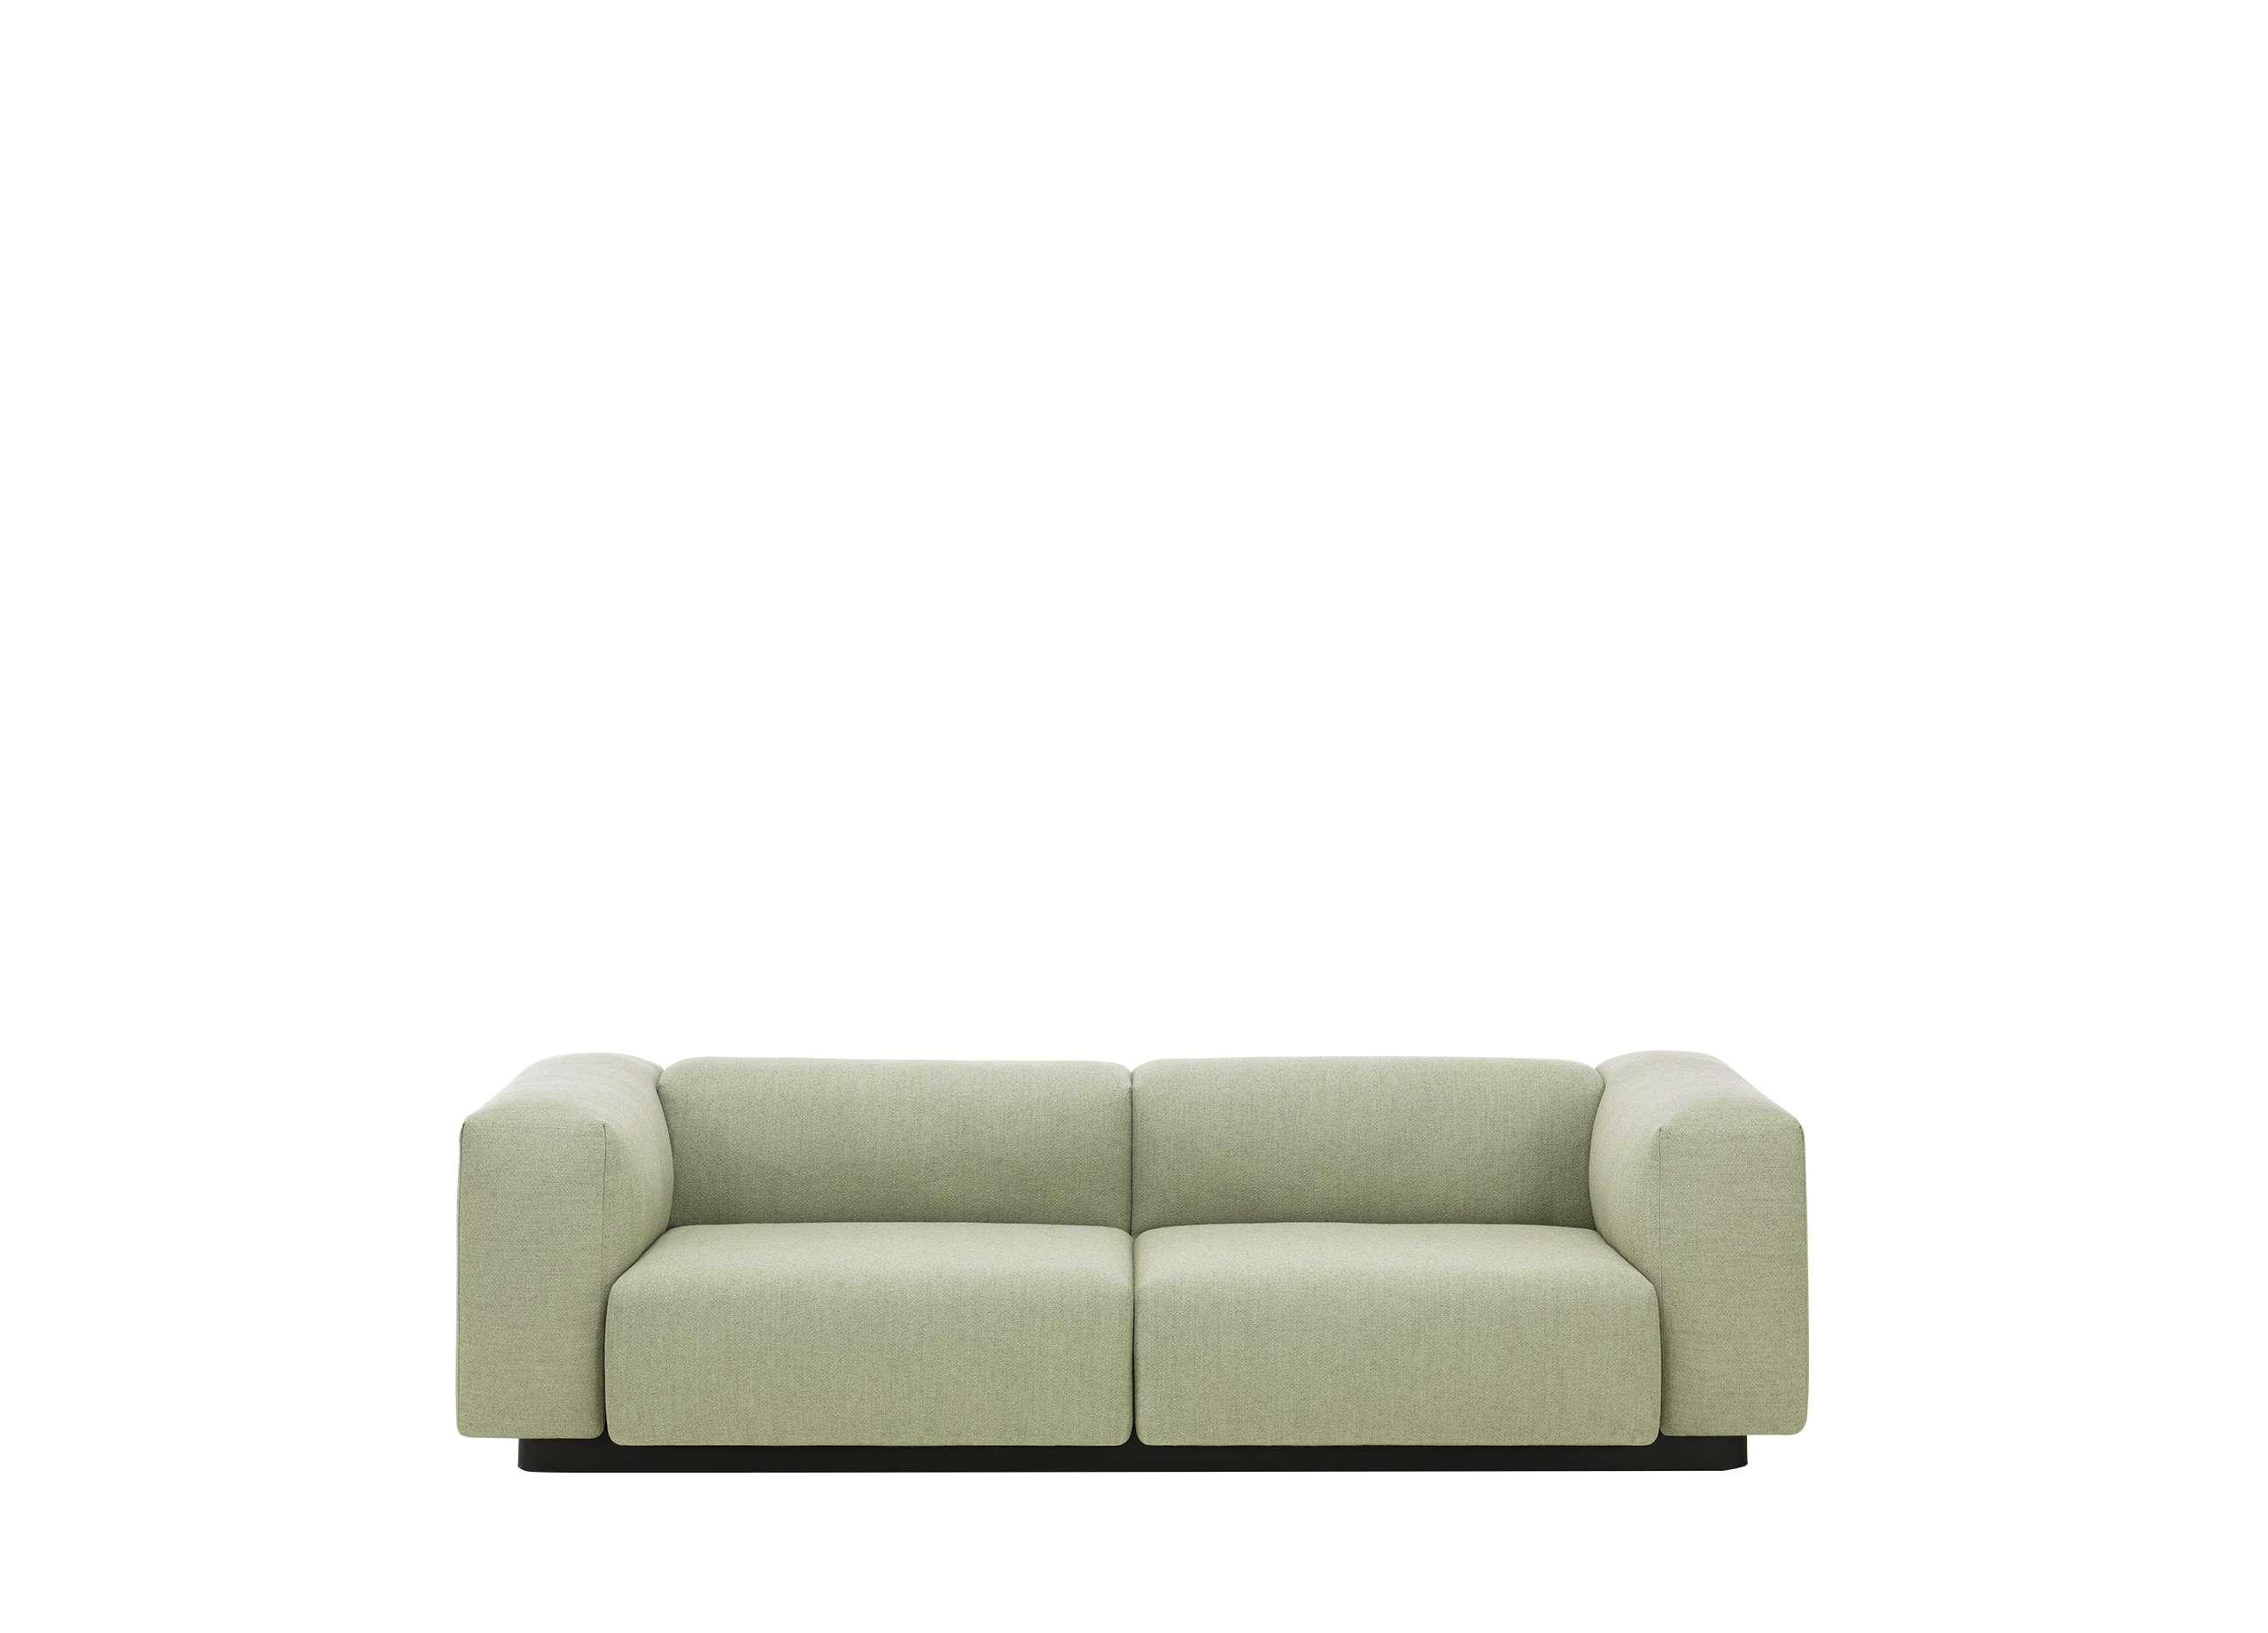 Sessel und Sofas Designersessel